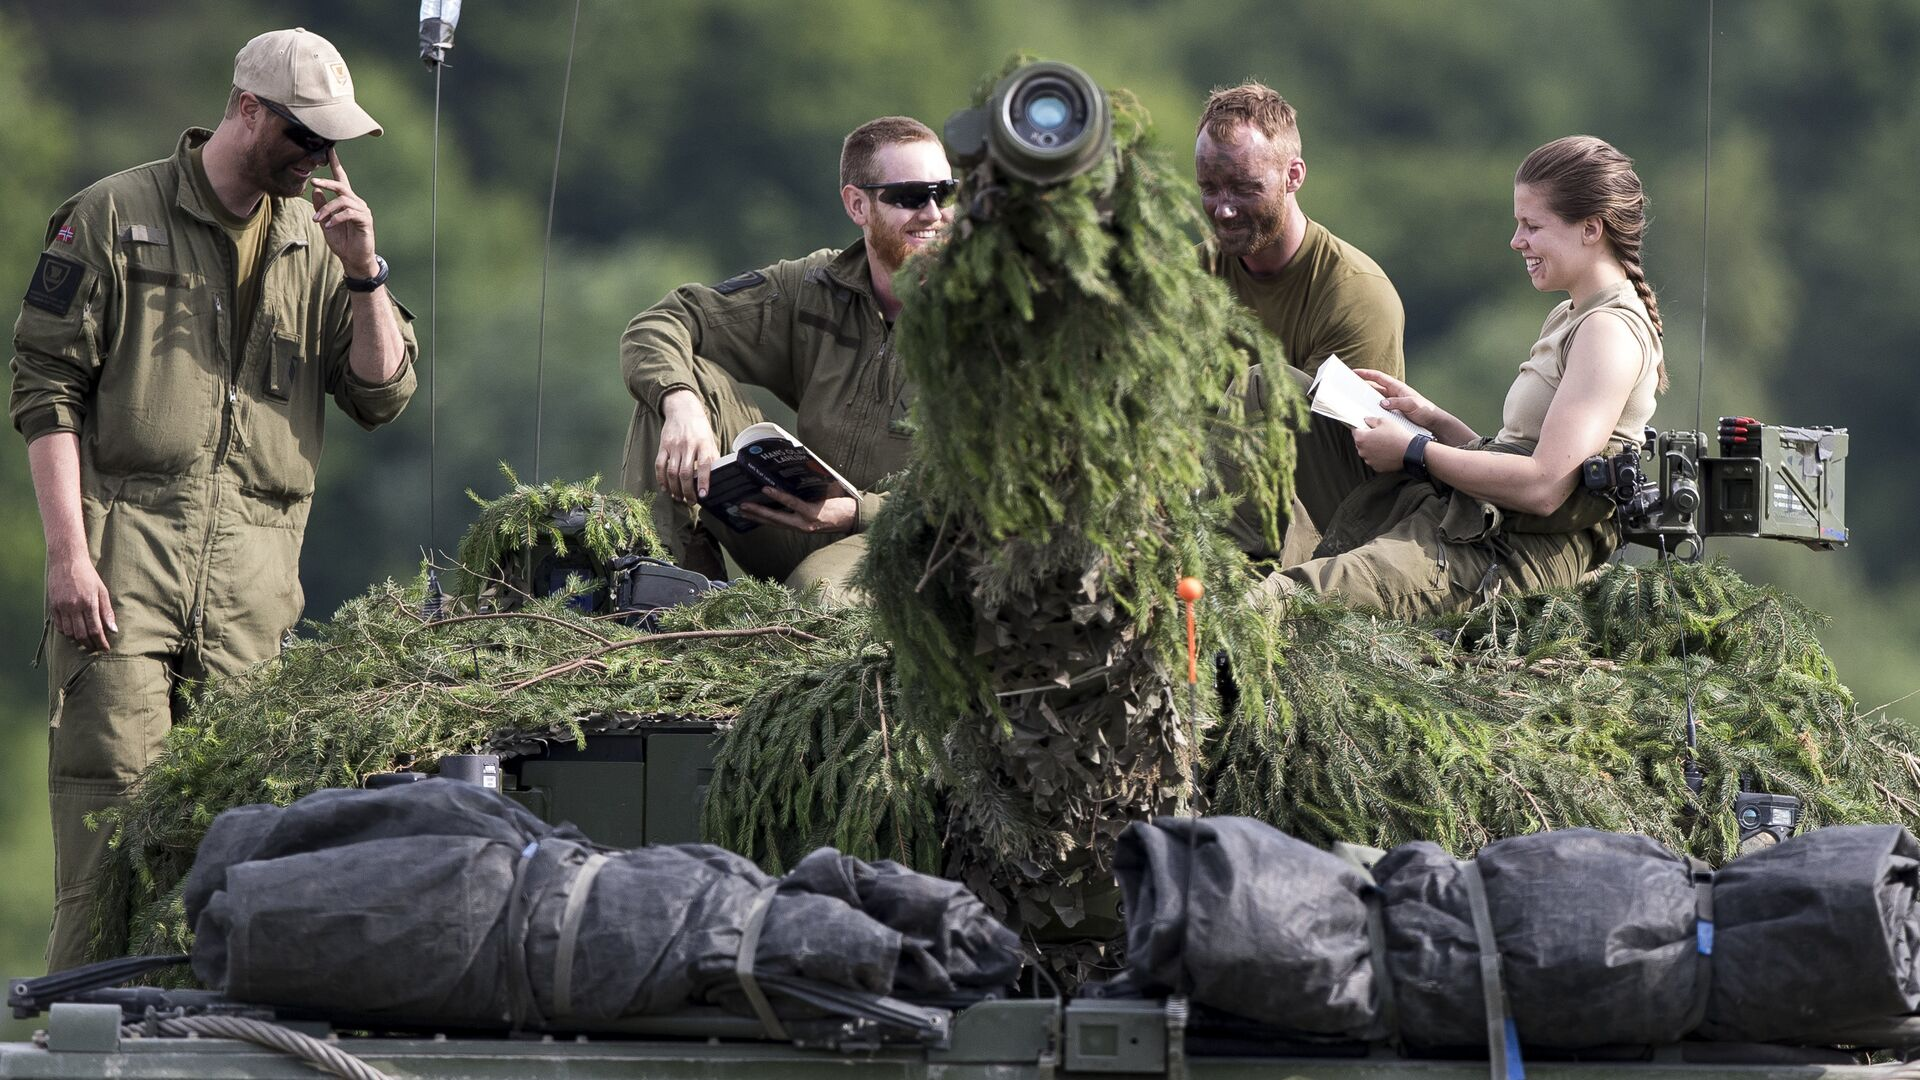 Учения НАТО Iron Wolf 2017 в Латвии. 20 июня 2017 - РИА Новости, 1920, 18.12.2020